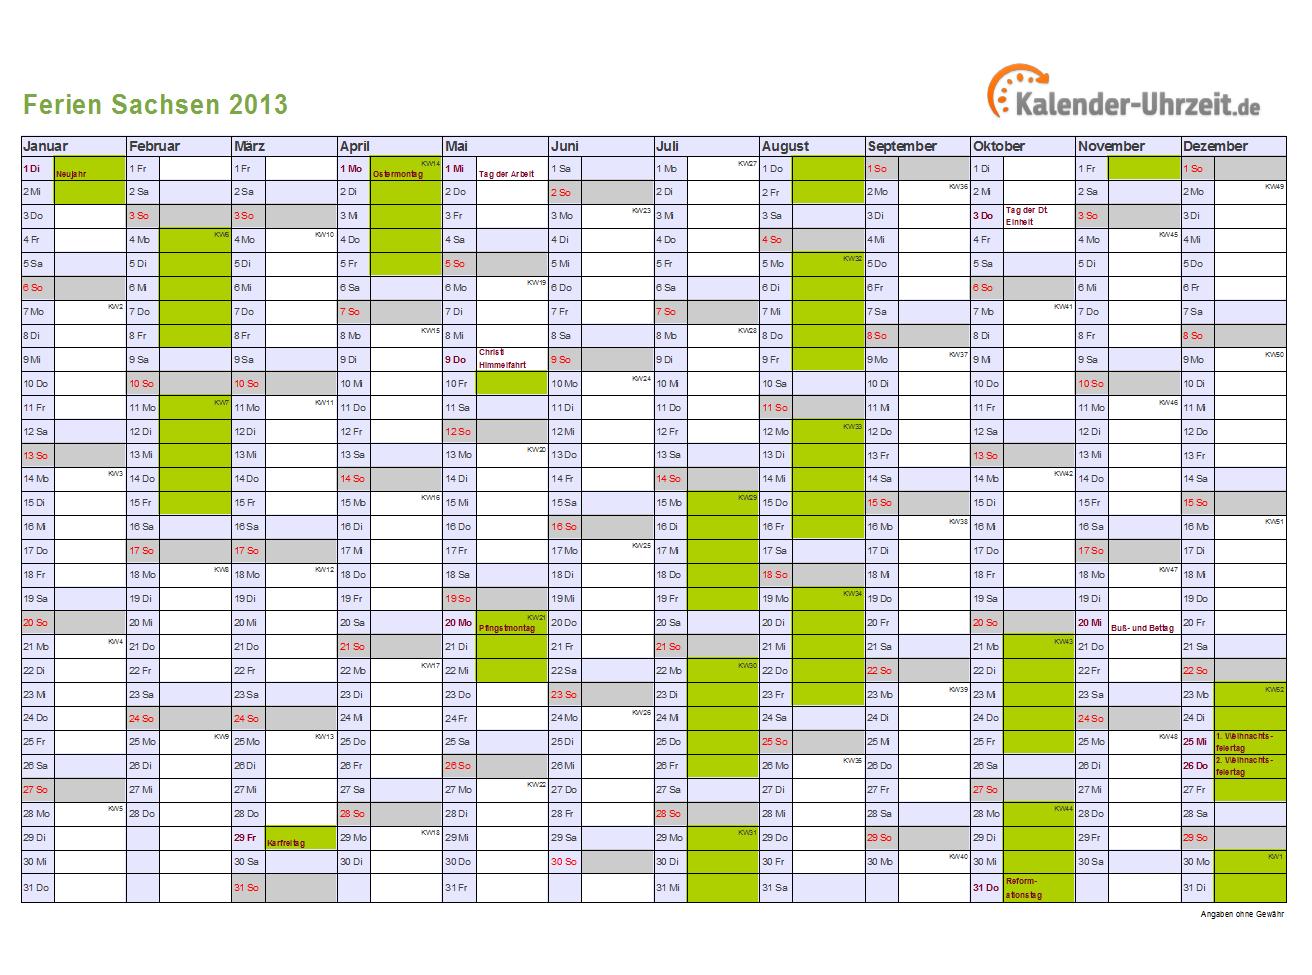 herbsferien 2015 new calendar template site. Black Bedroom Furniture Sets. Home Design Ideas